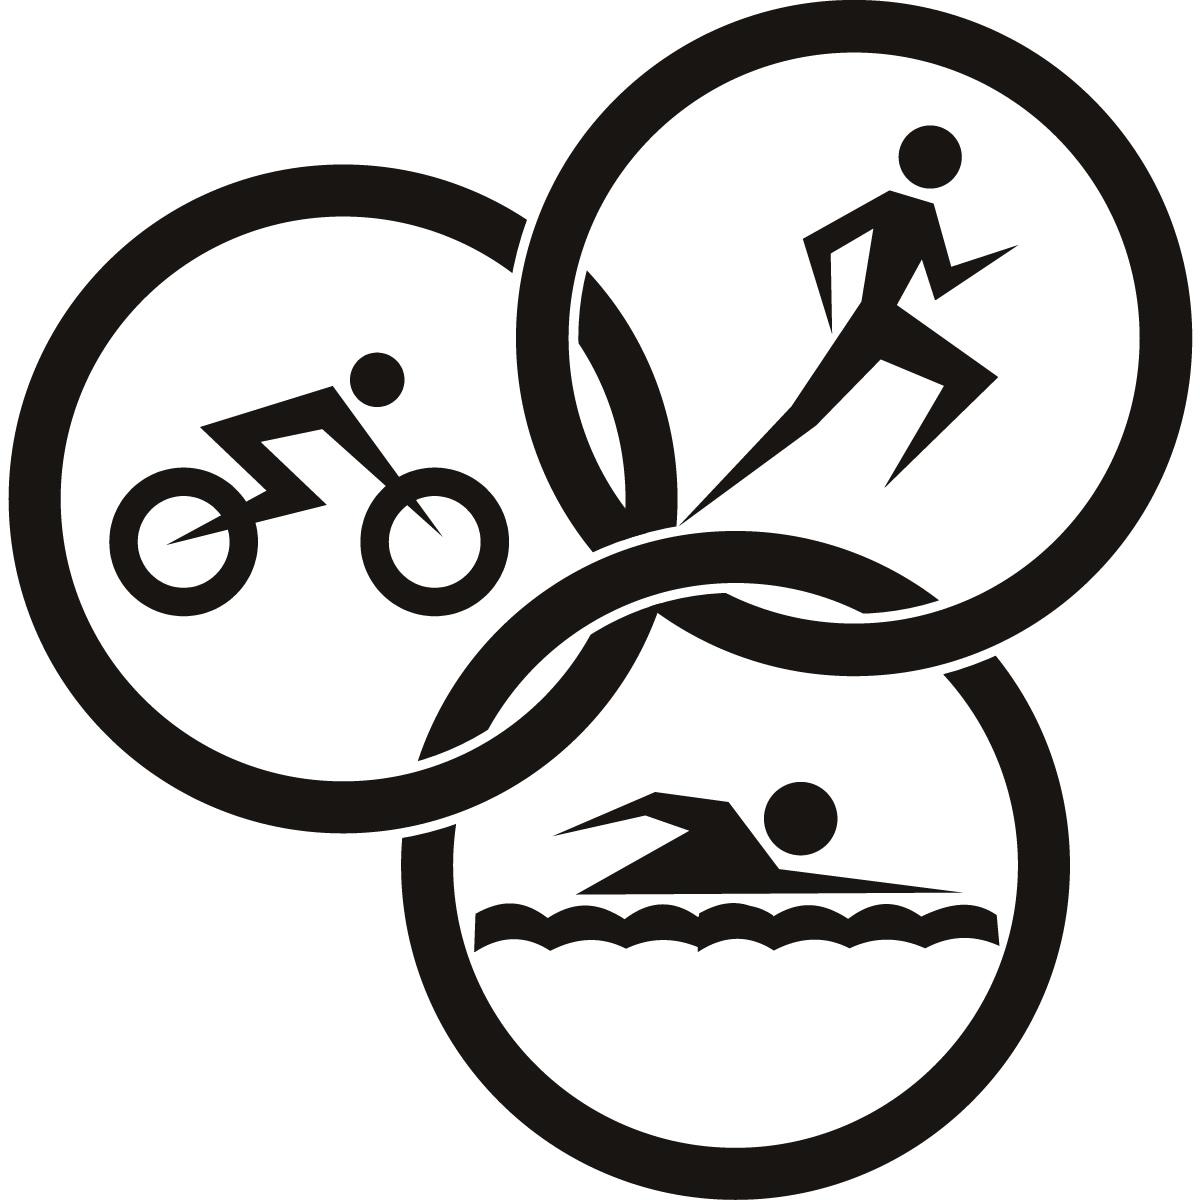 Triathlon Circles Athletics Wall ART Sti-Triathlon Circles Athletics Wall ART Sticker Wall Decals Transfers .-12